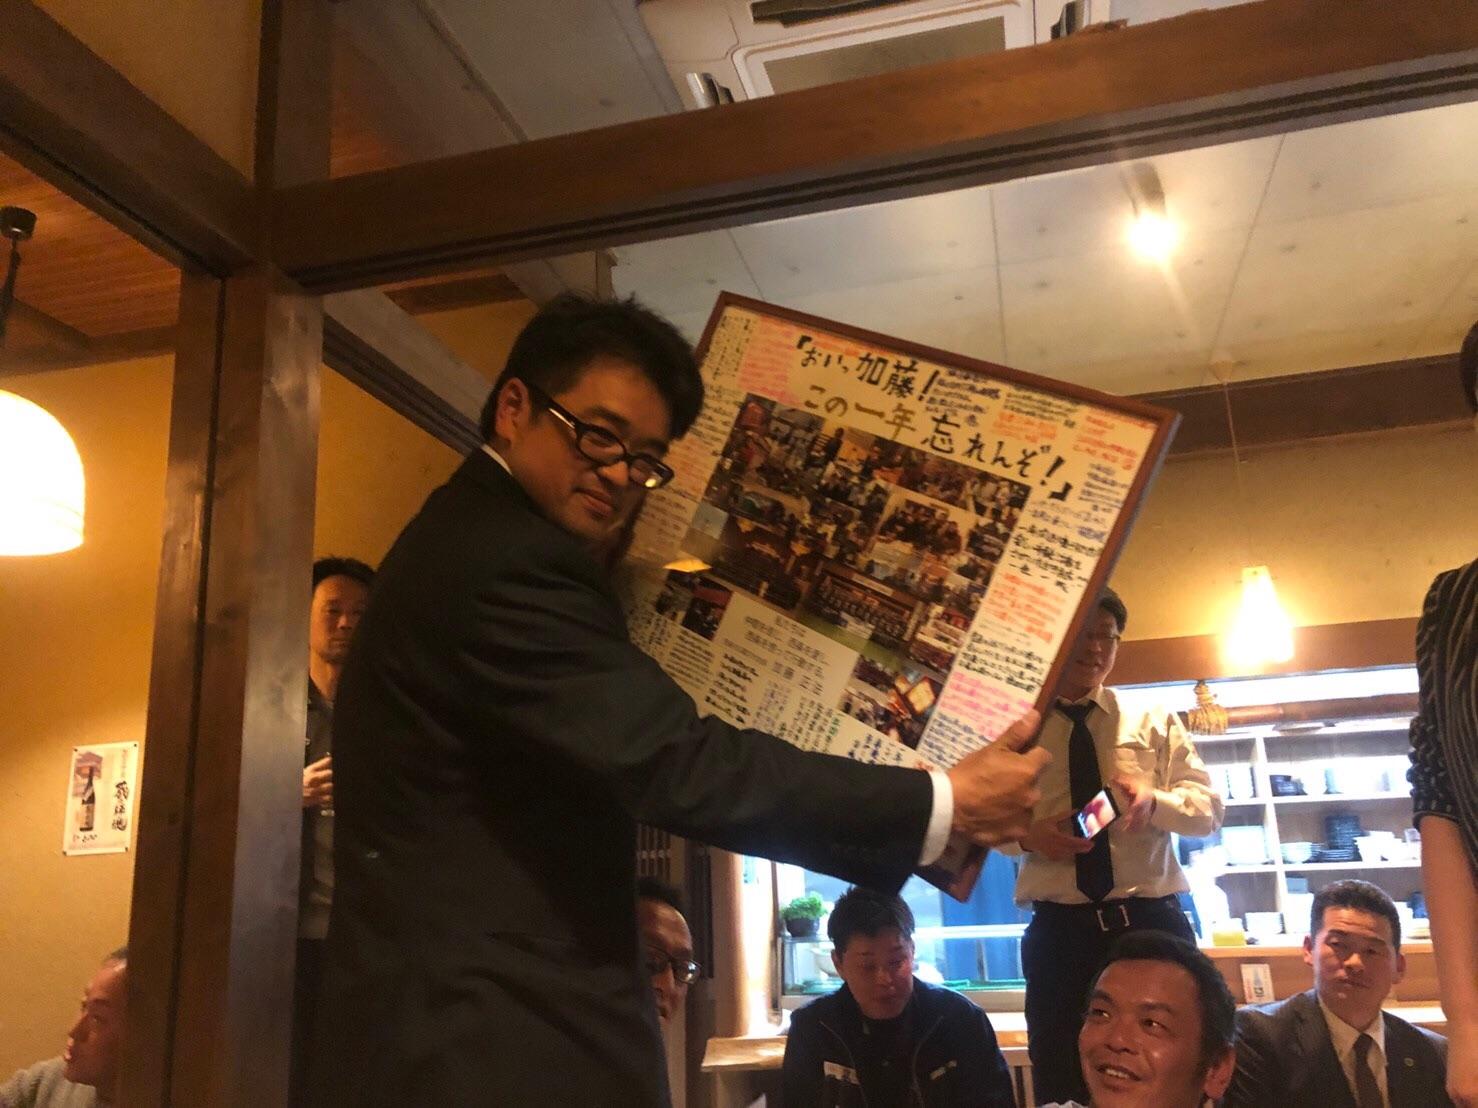 f:id:masanori-kato1972:20190326105828j:image